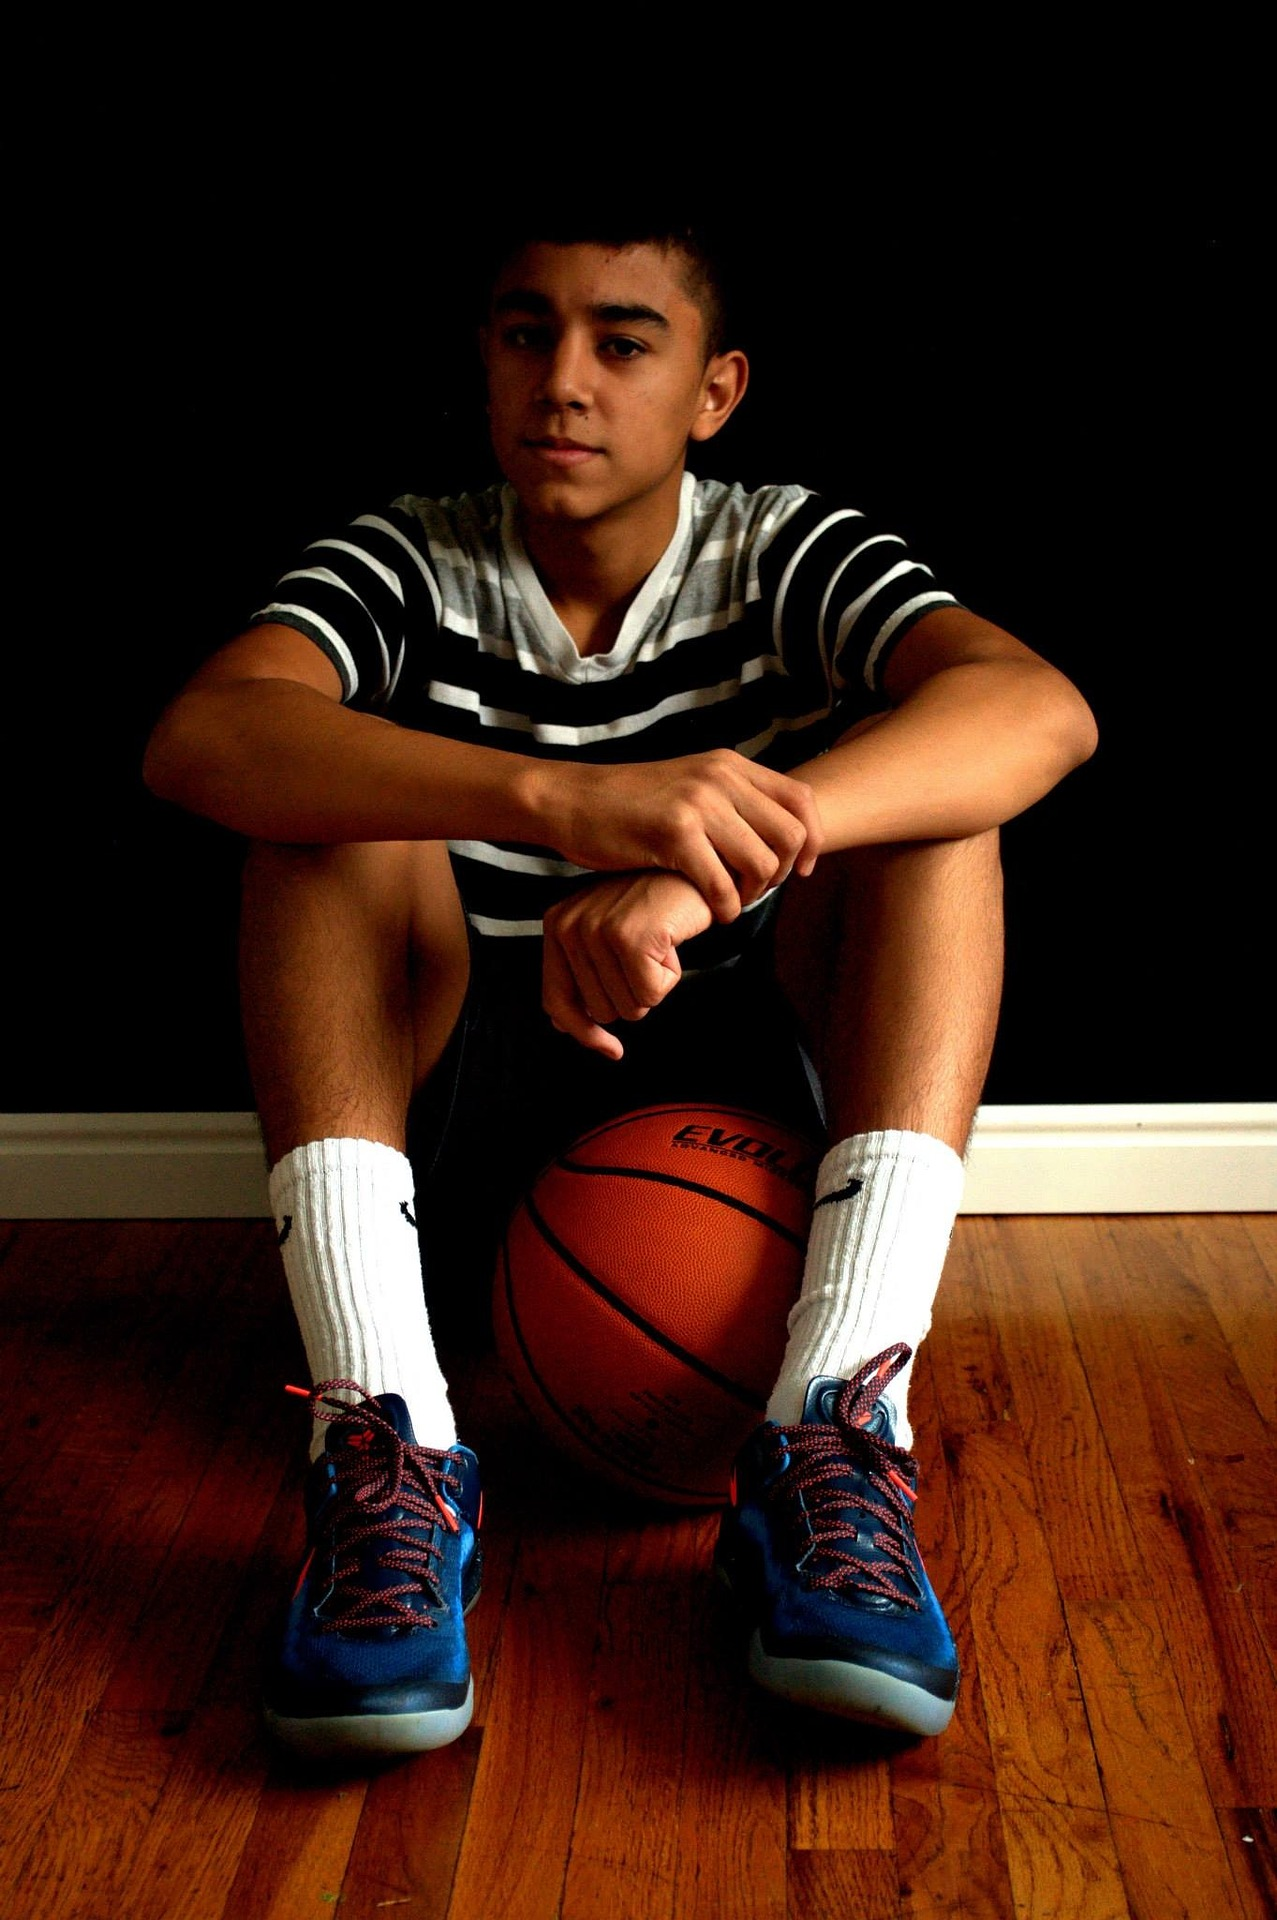 Black teen basketball players